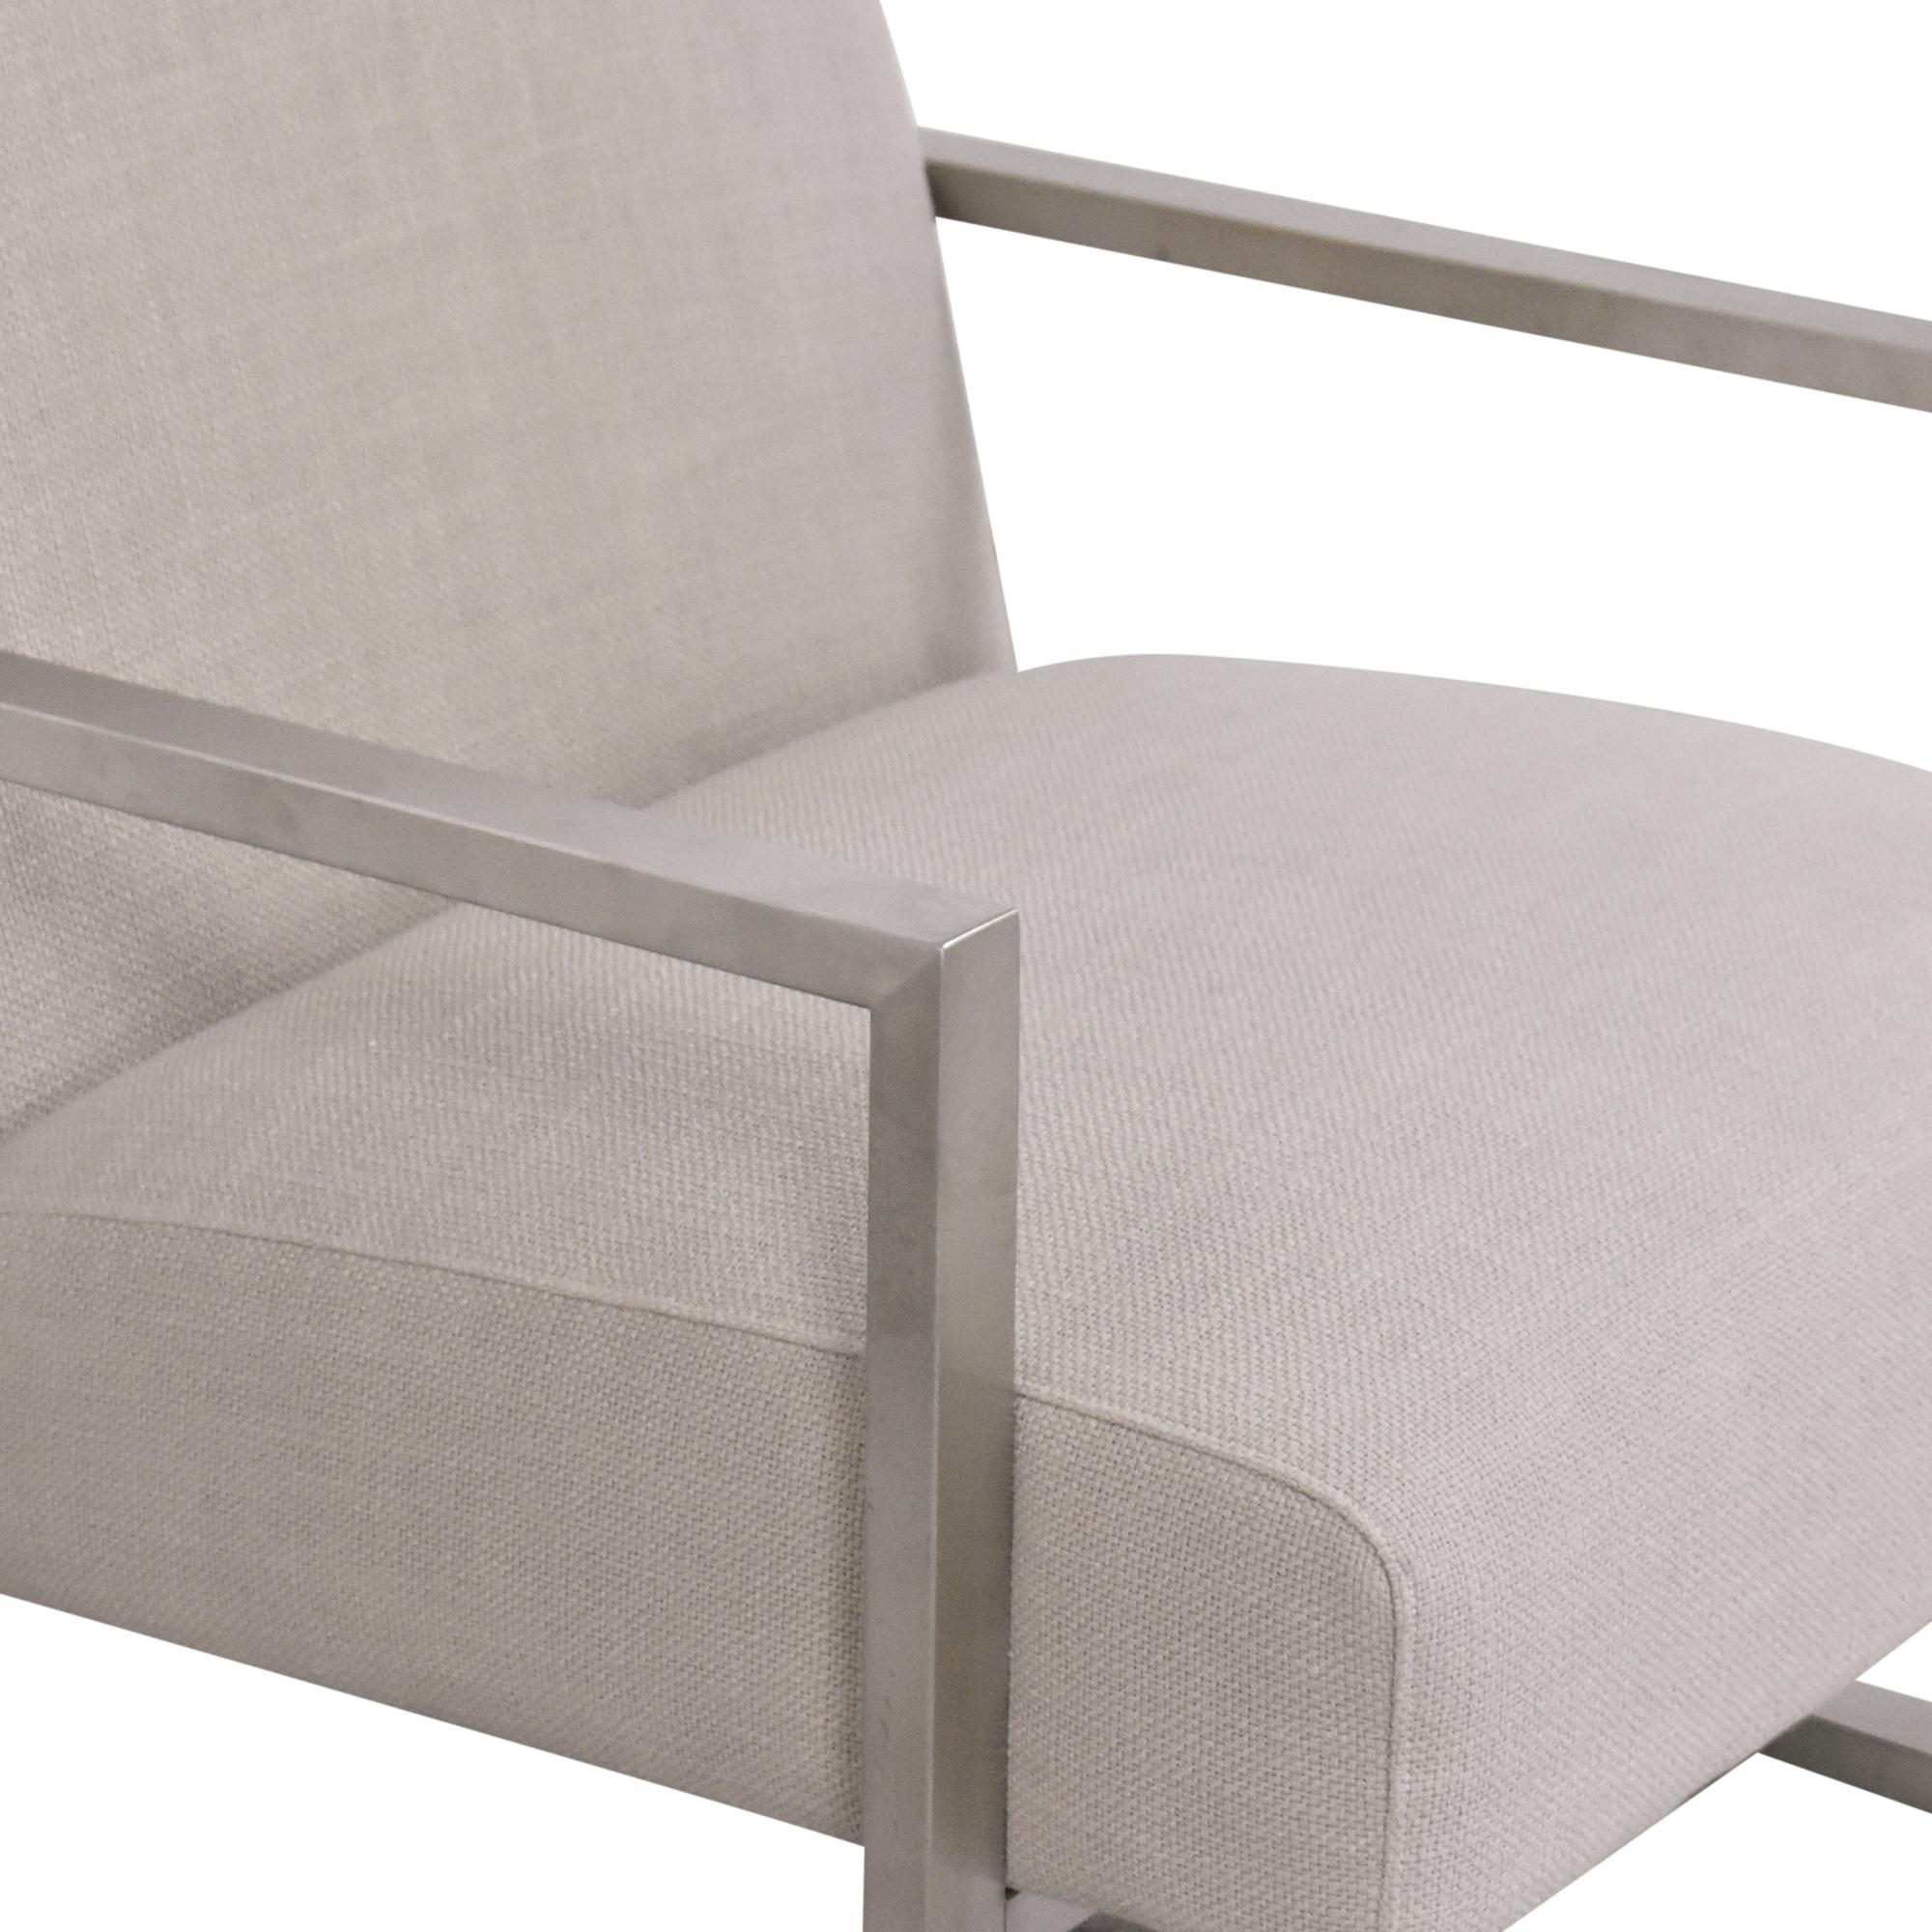 Armen Living Armen Living Skyline Accent Chair used